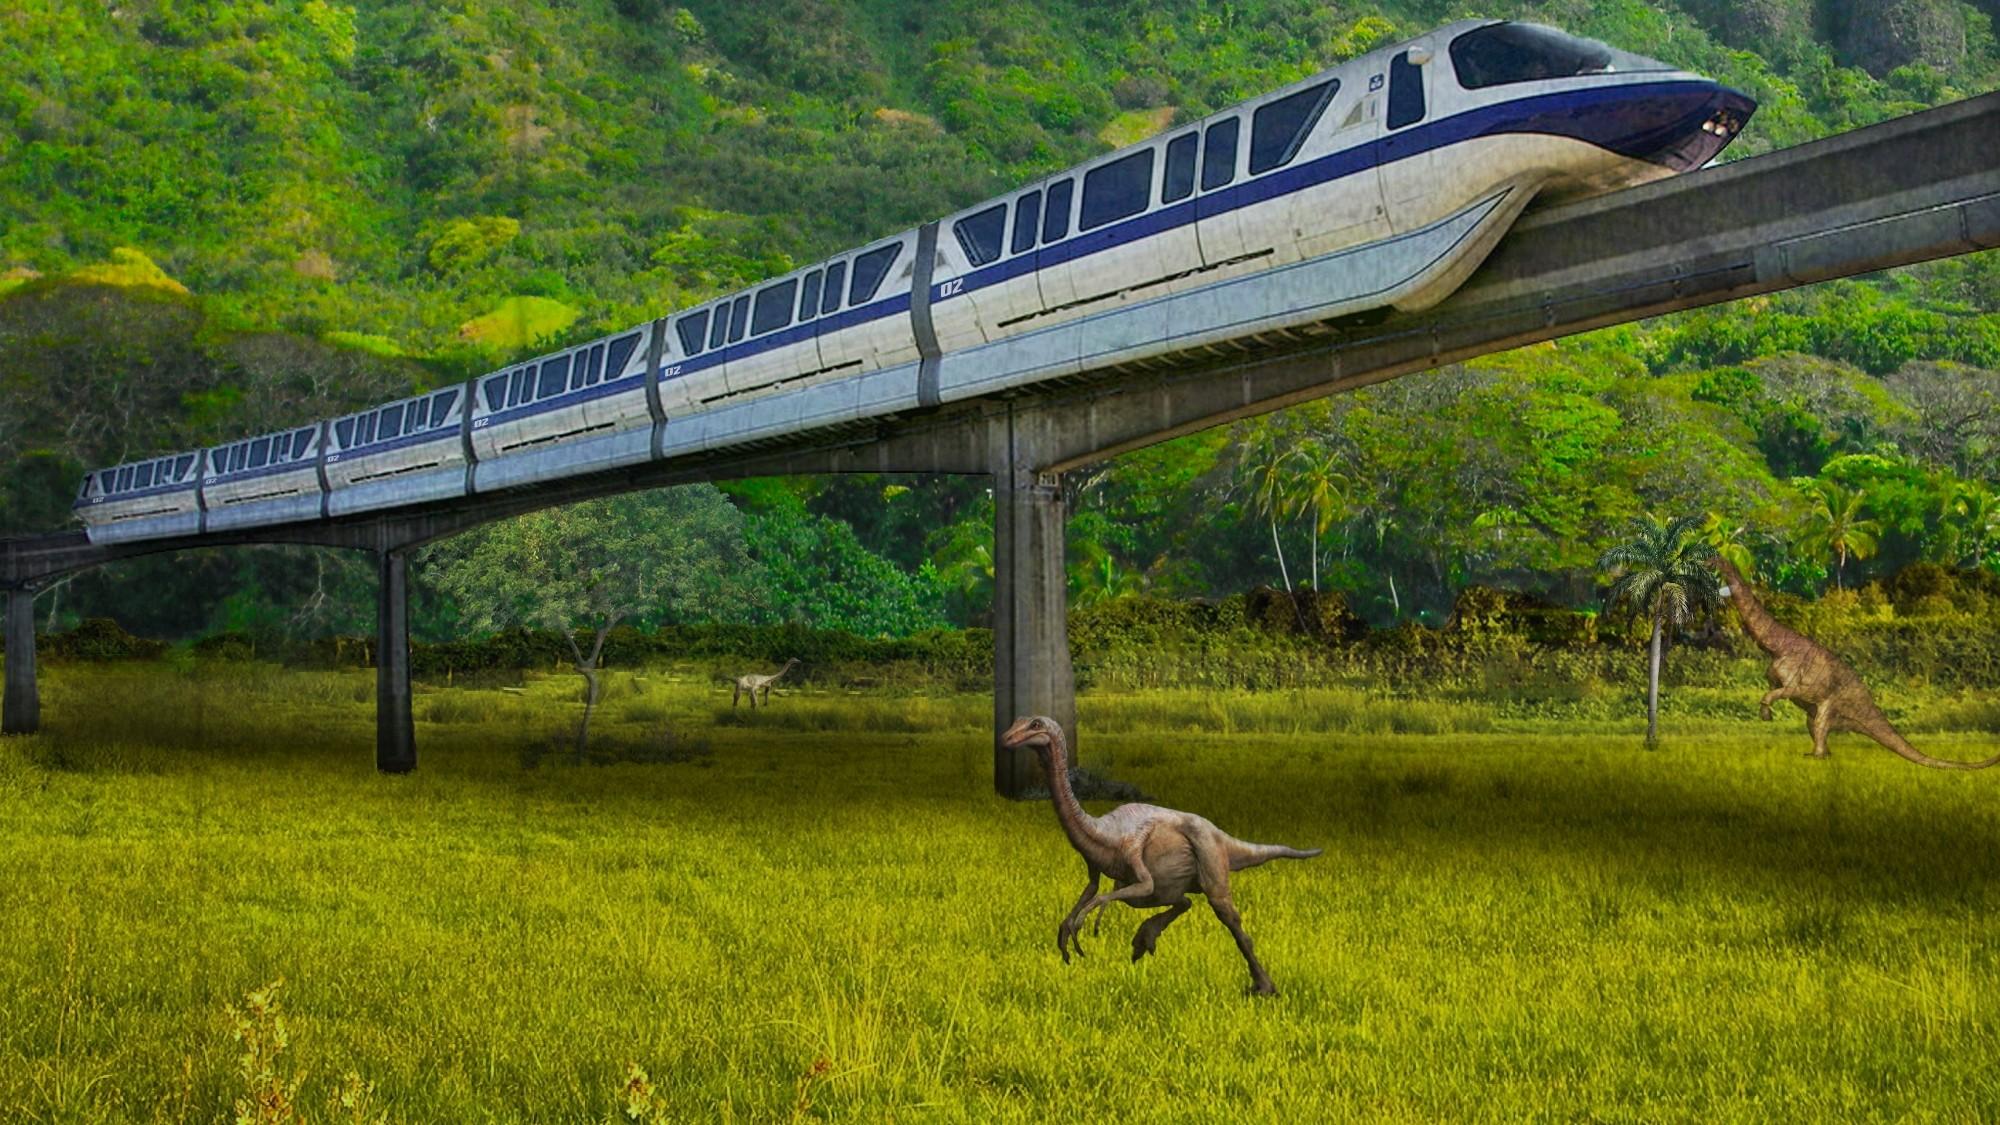 Res: 2000x1125, Jurassic World (1) Jurassic World (2) ...